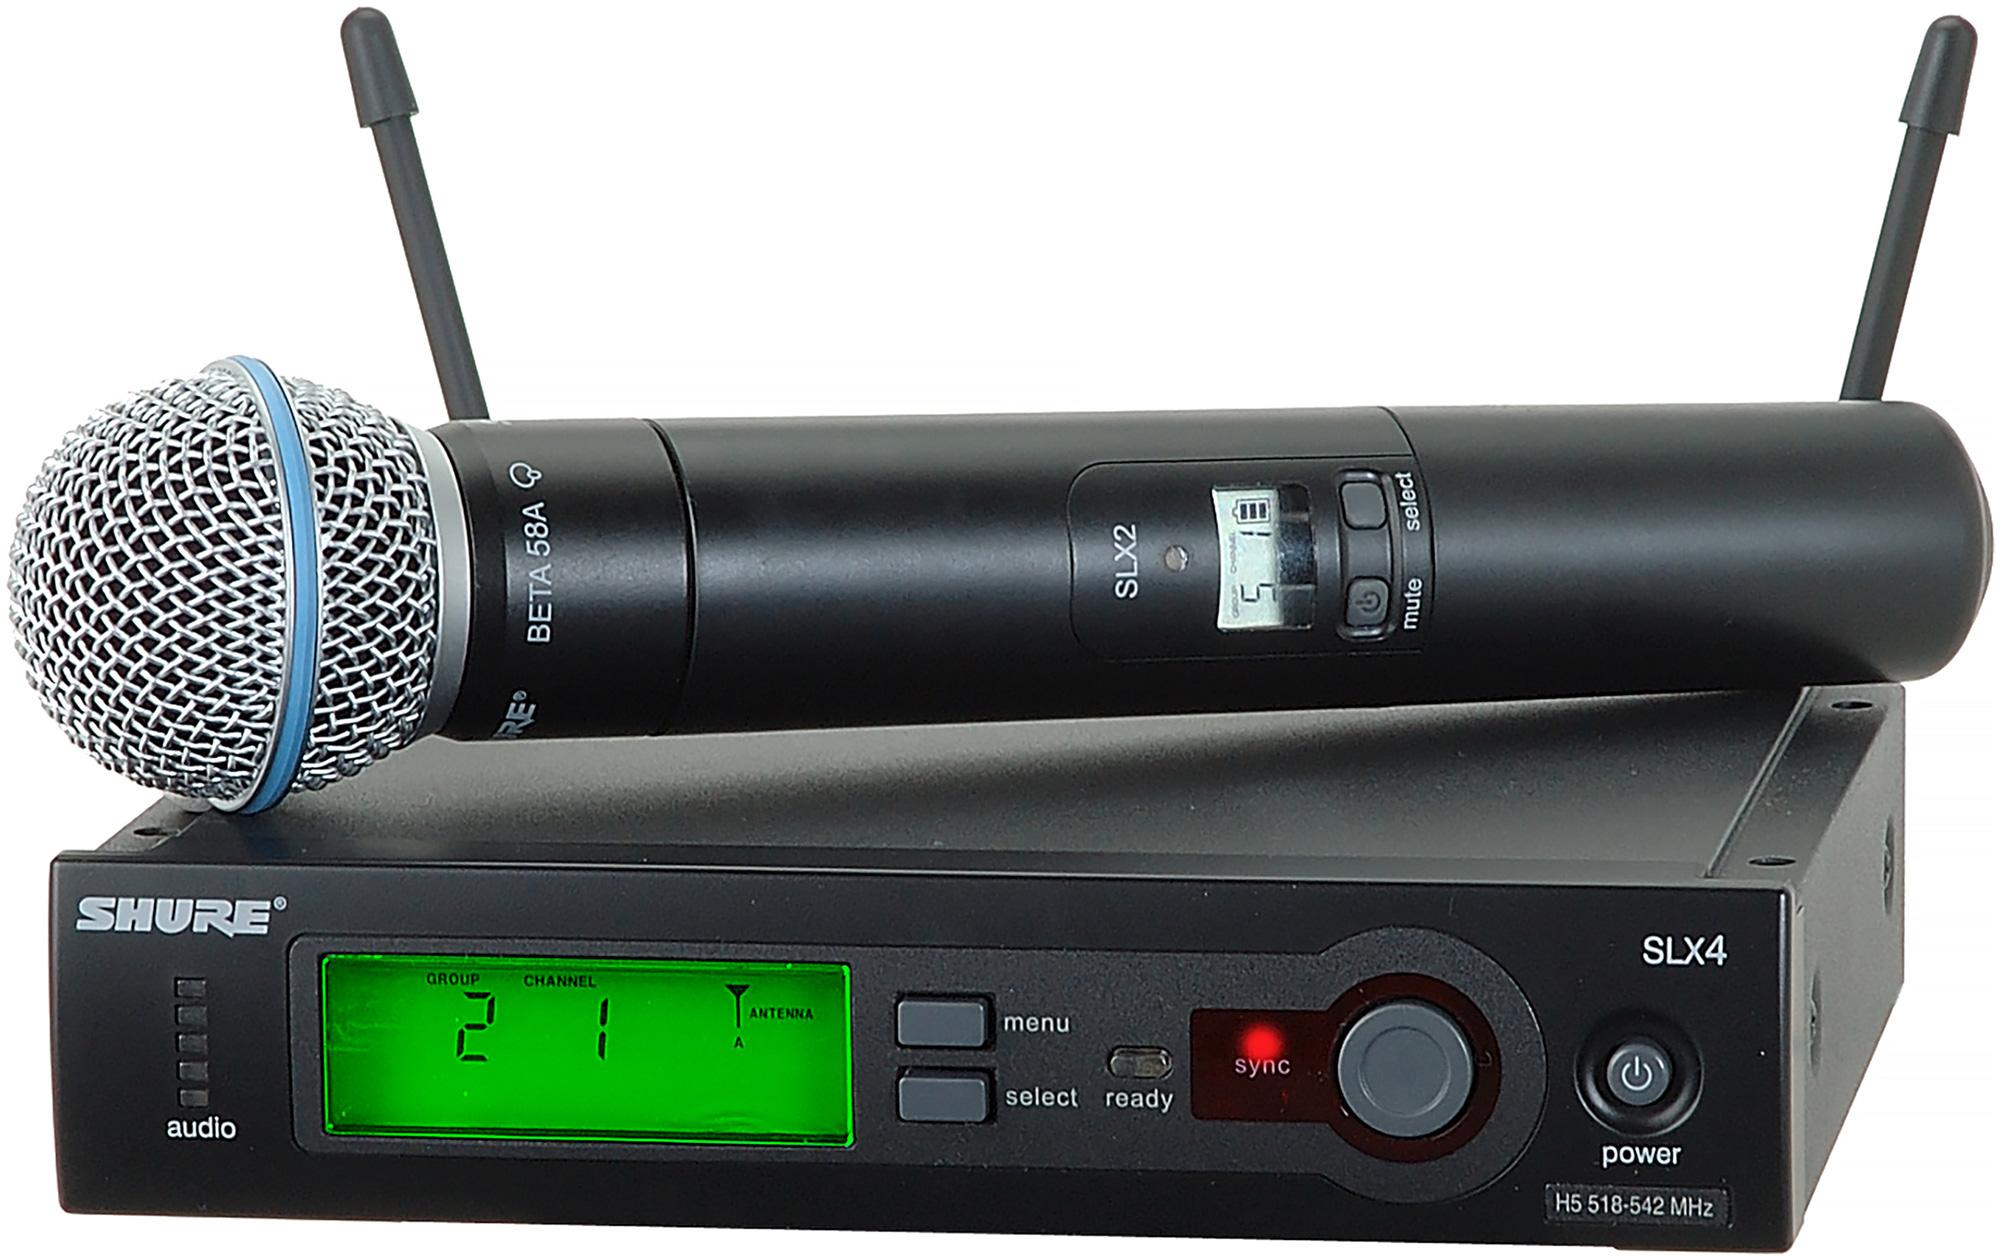 shure slx wireless system with beta58 handheld mic j3 572 596 mhz. Black Bedroom Furniture Sets. Home Design Ideas